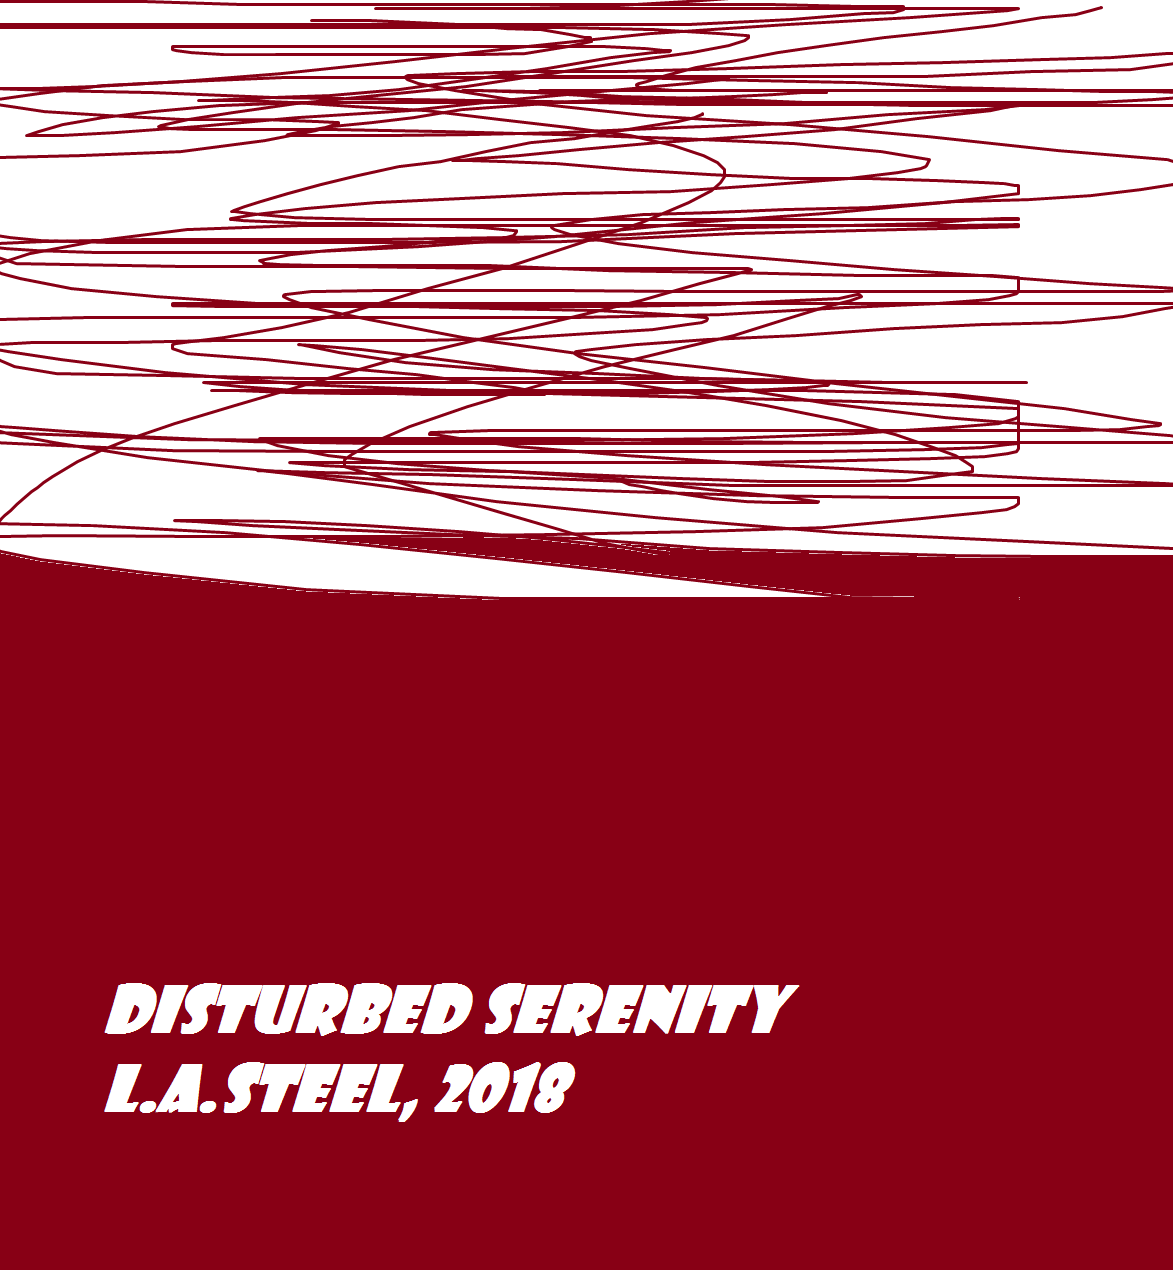 disturbed serenity 2018